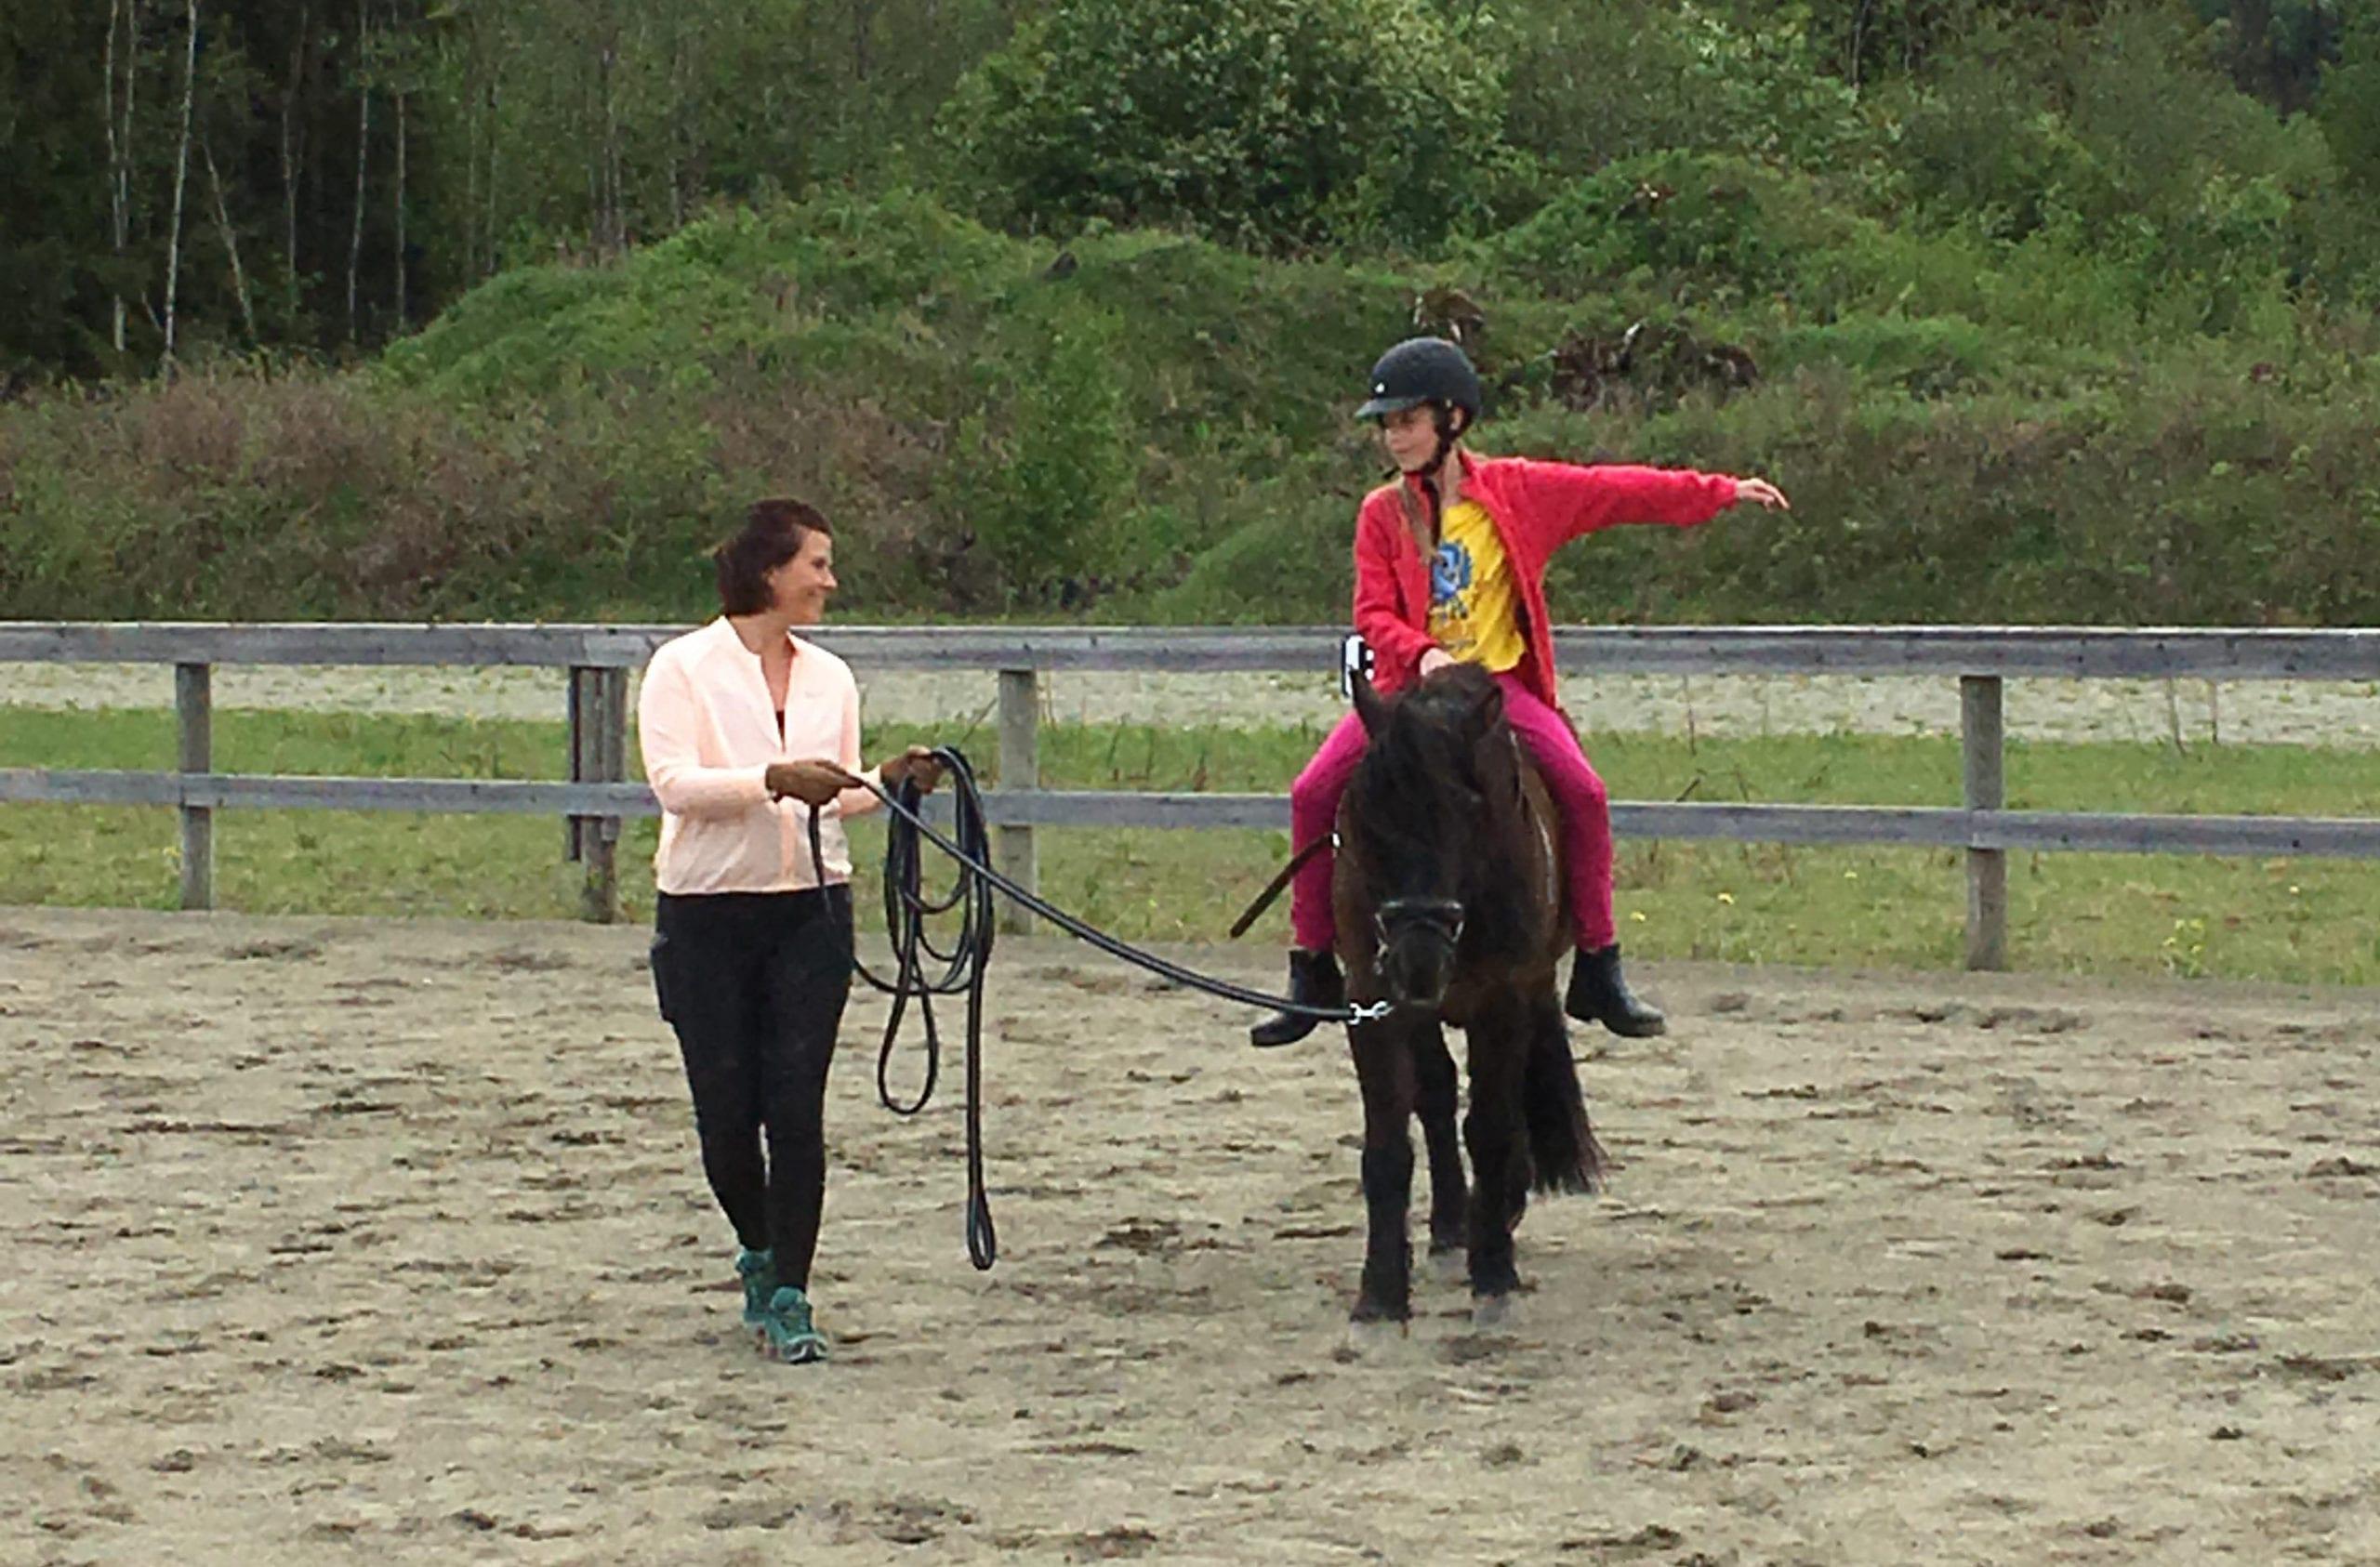 Rideundervisning med Therese Heramb